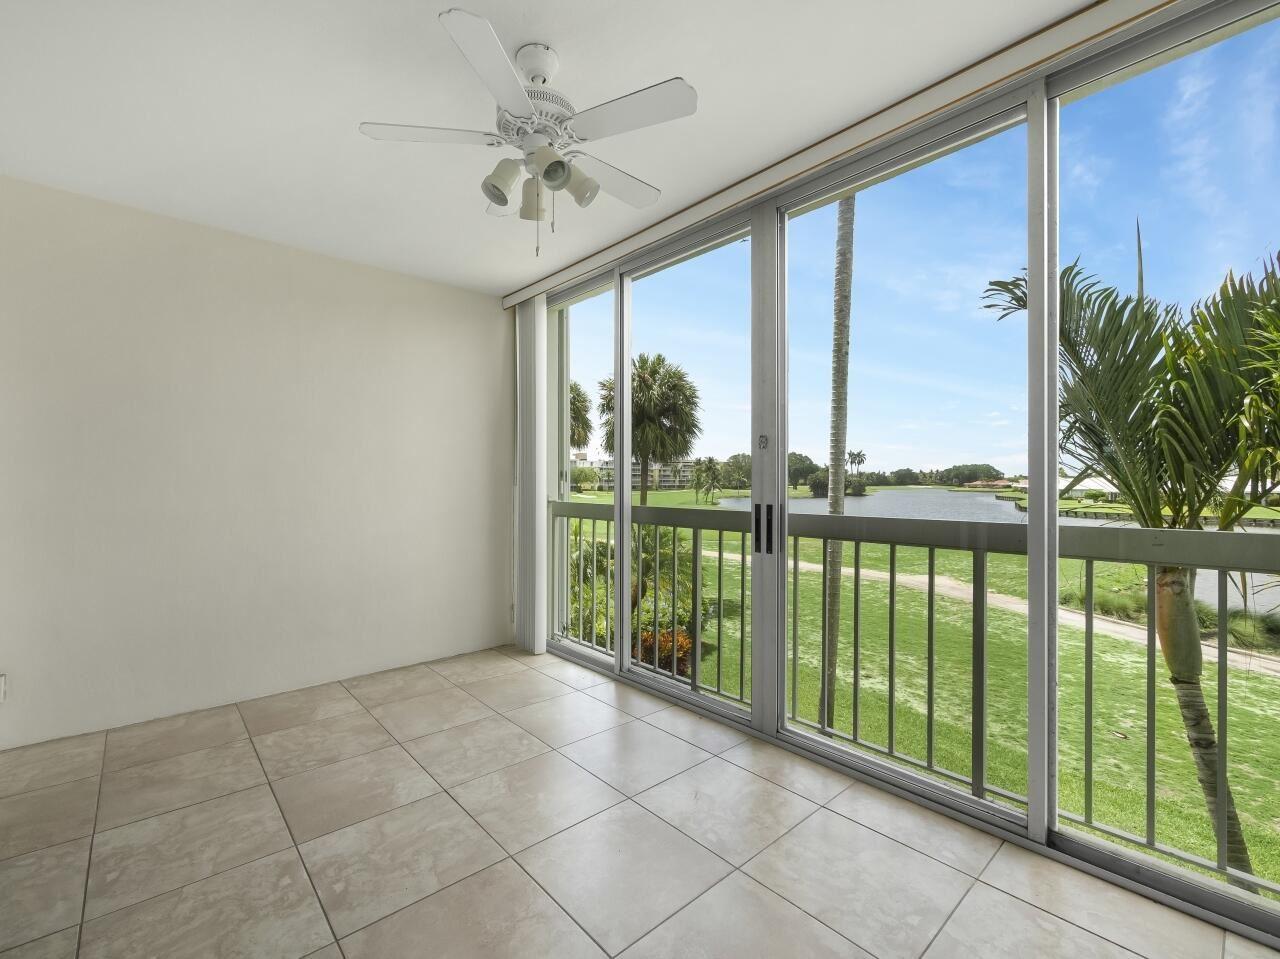 169 Atlantis 206 Boulevard #206, Atlantis, FL 33462 - #: RX-10721804